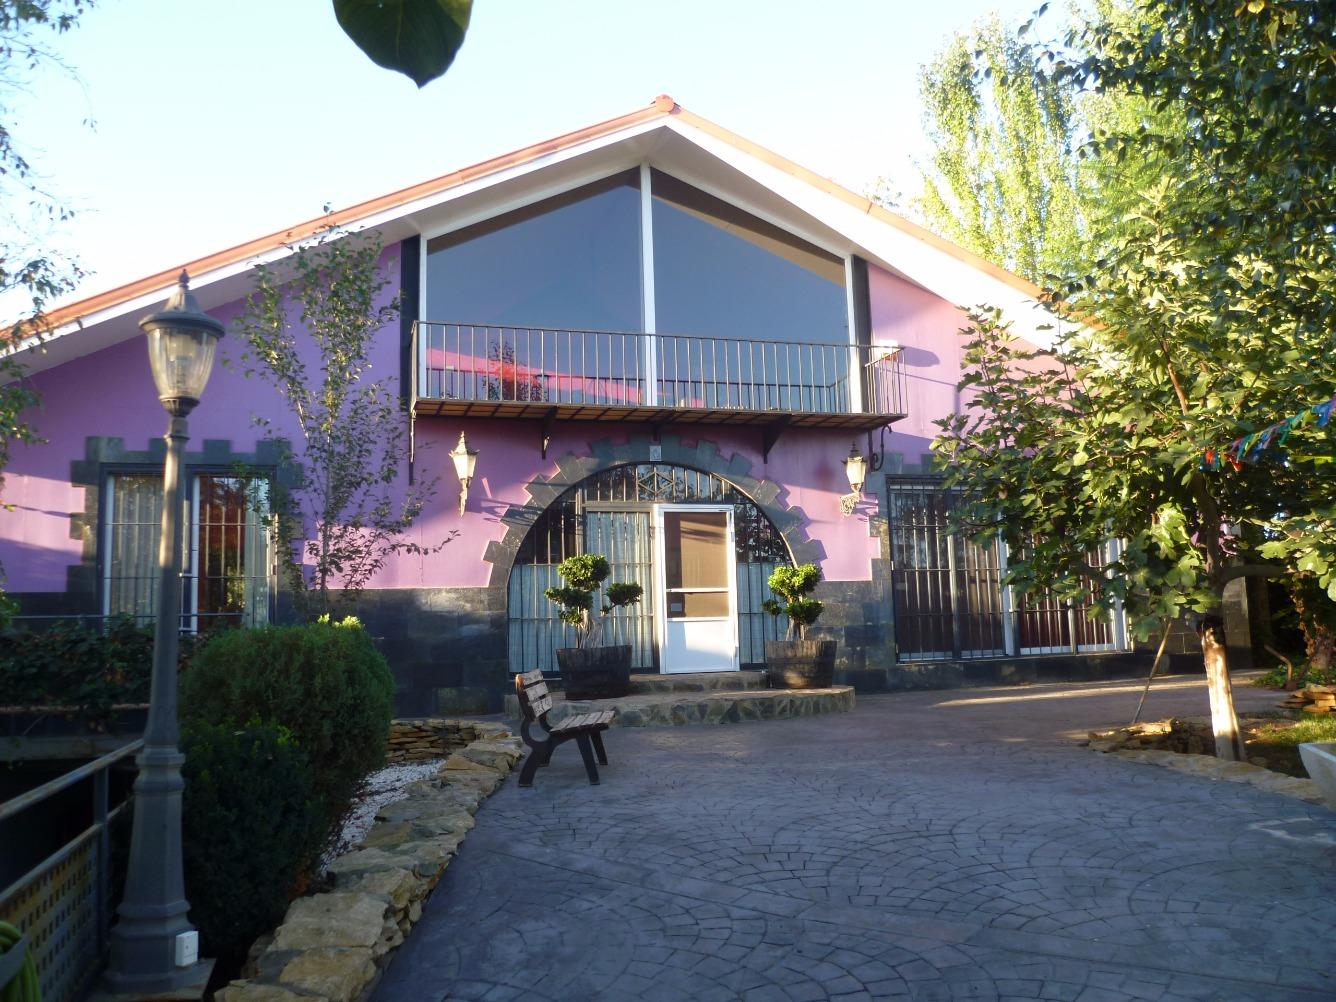 Chalet en venta en Almazora, Zona de - Almazora Almassora